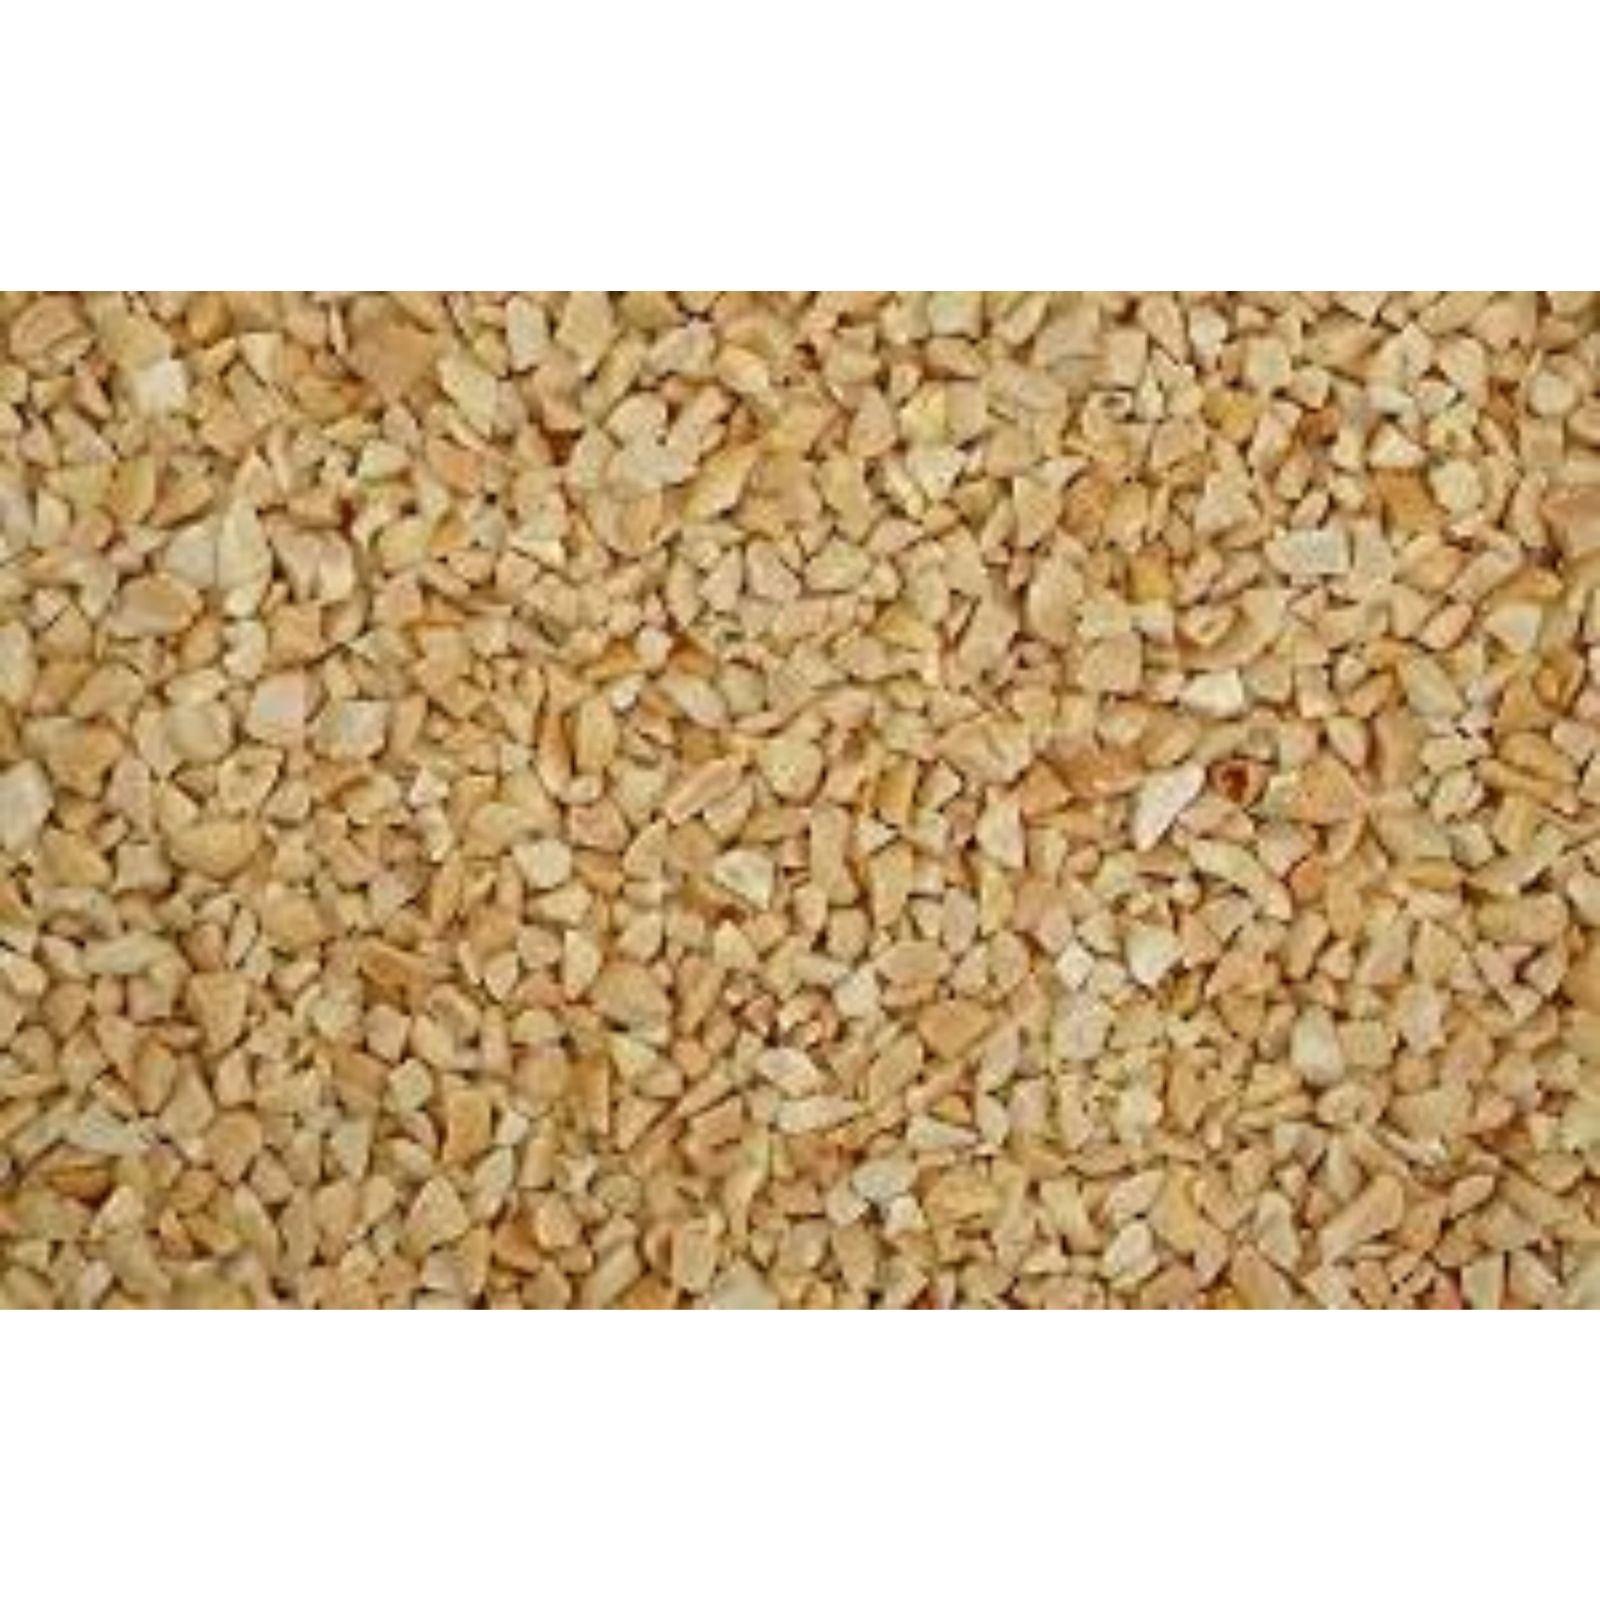 Peanuts Chopped -25Lbs